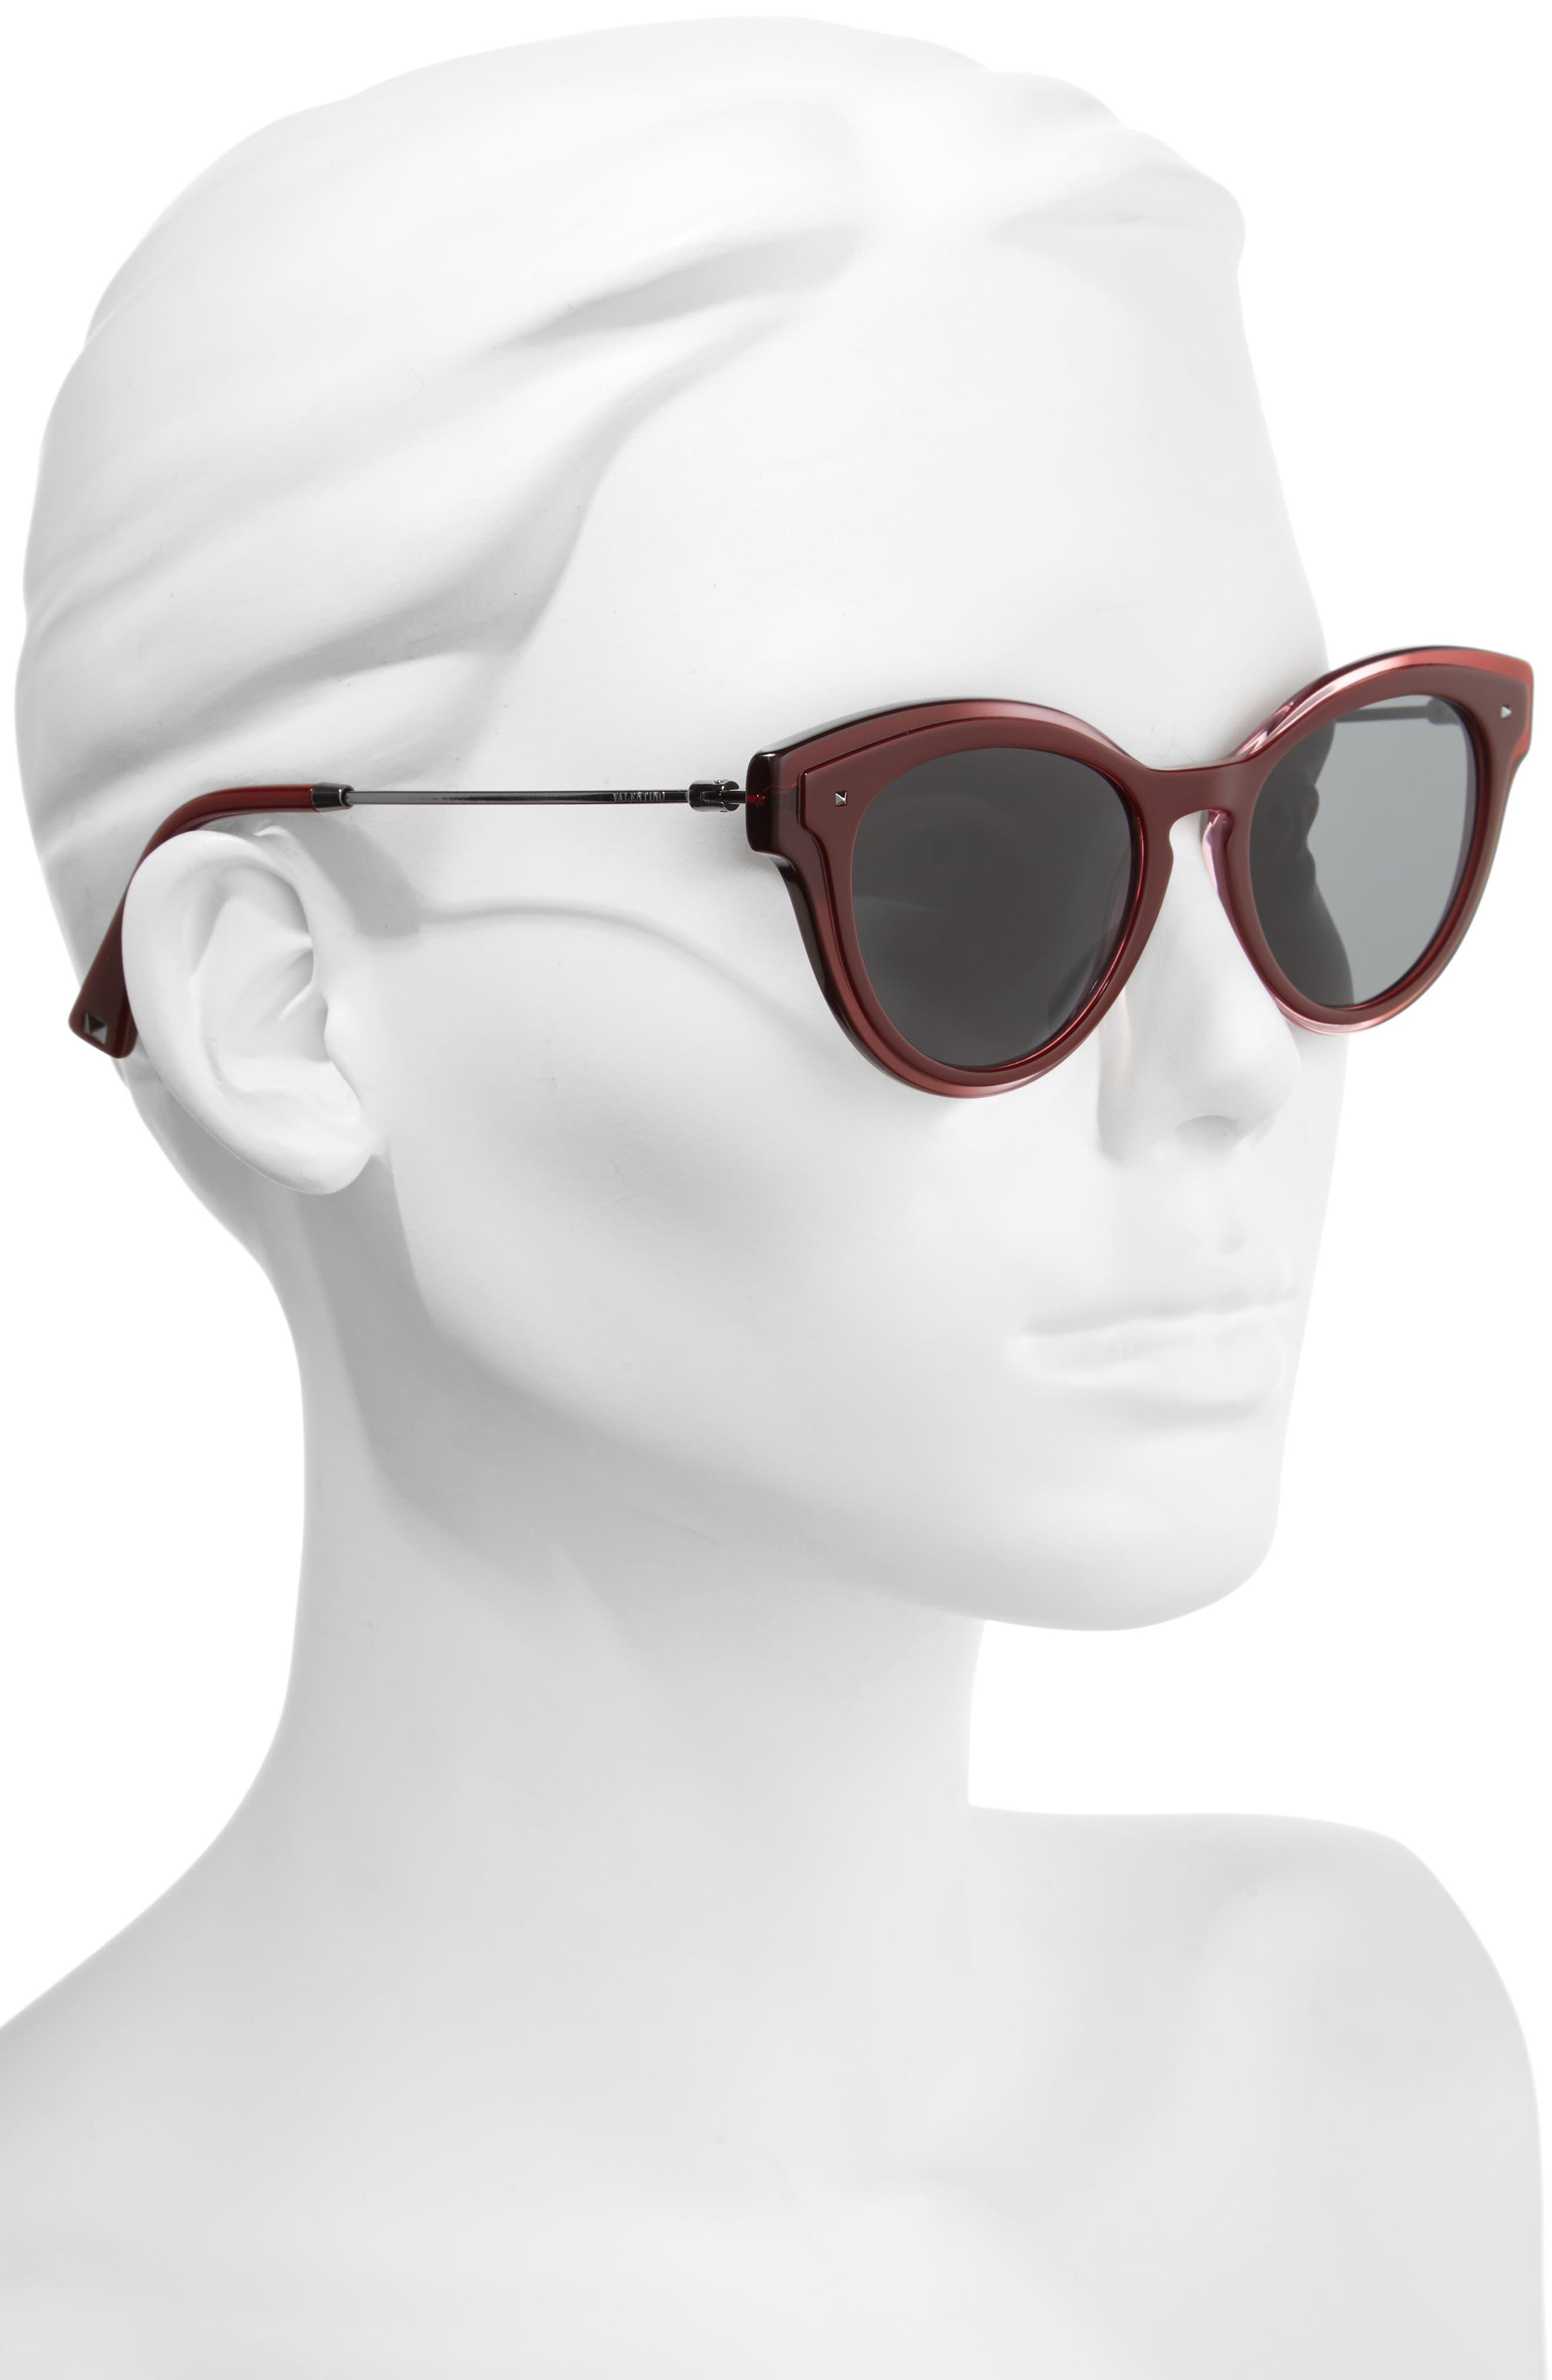 51mm Cat Eye Sunglasses,                             Alternate thumbnail 2, color,                             600